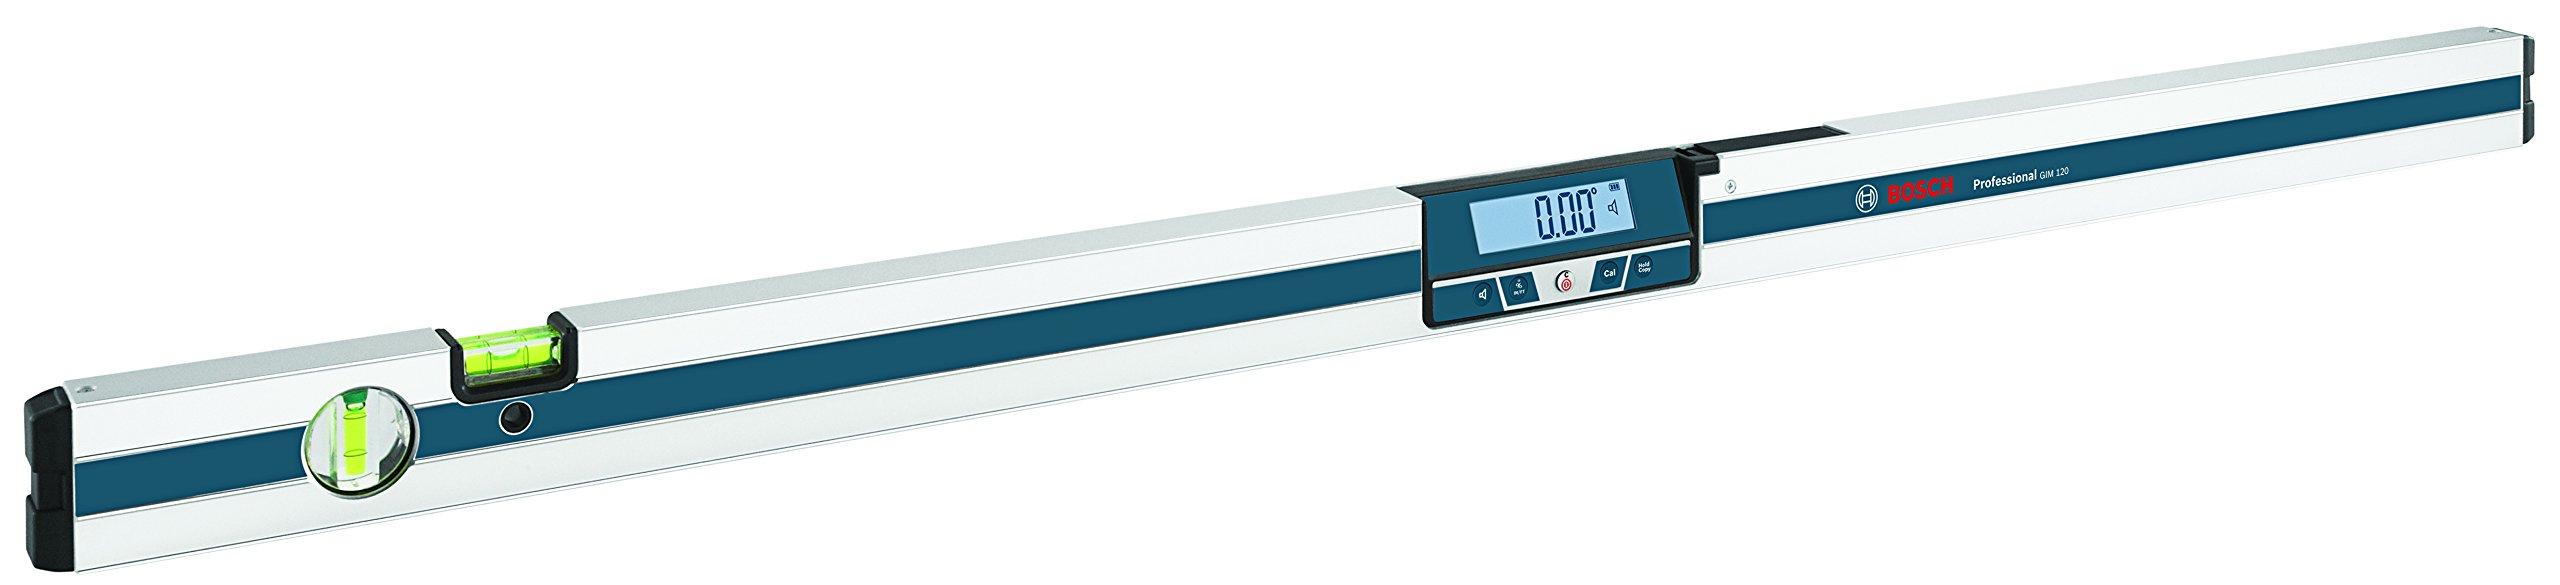 Bosch Digital Level, 48'' GIM 120